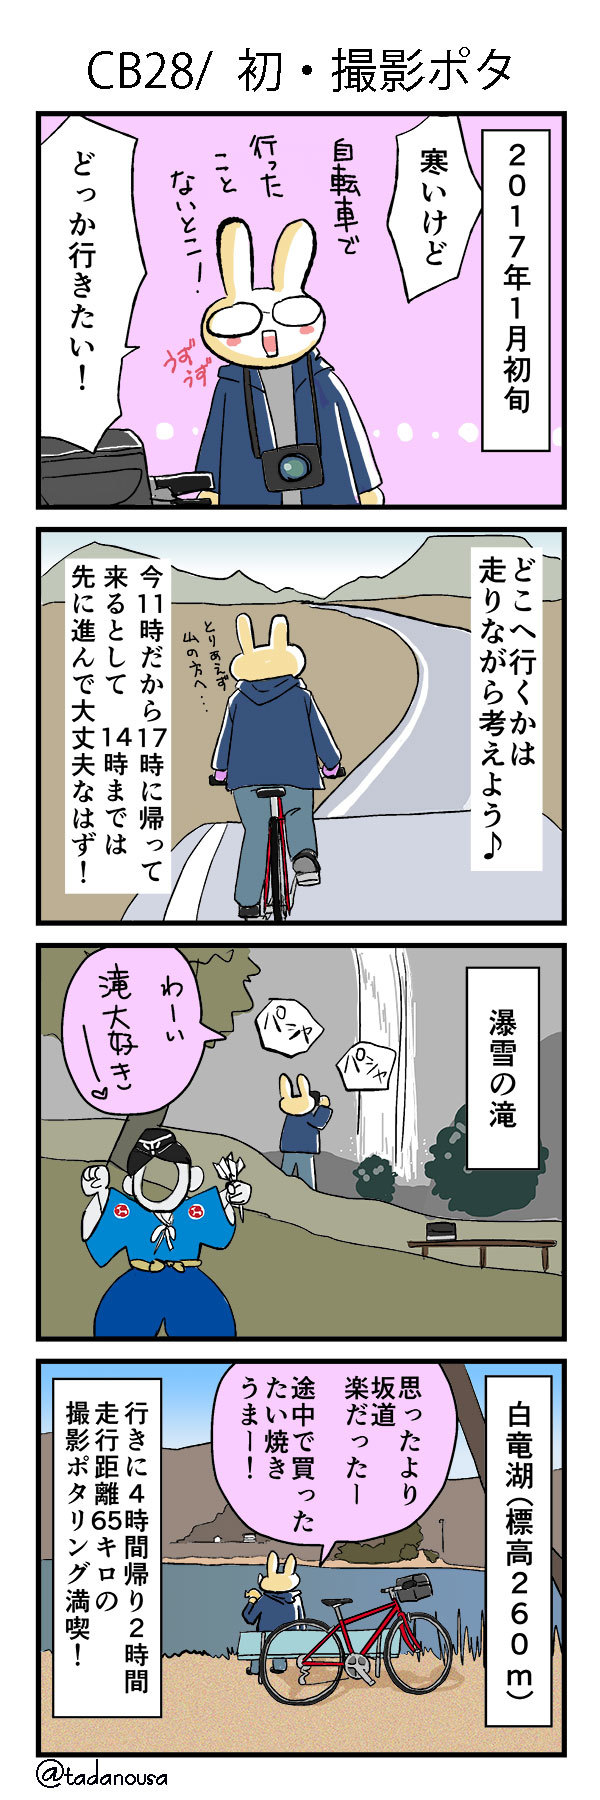 bike_4koma_kako068_s.jpg